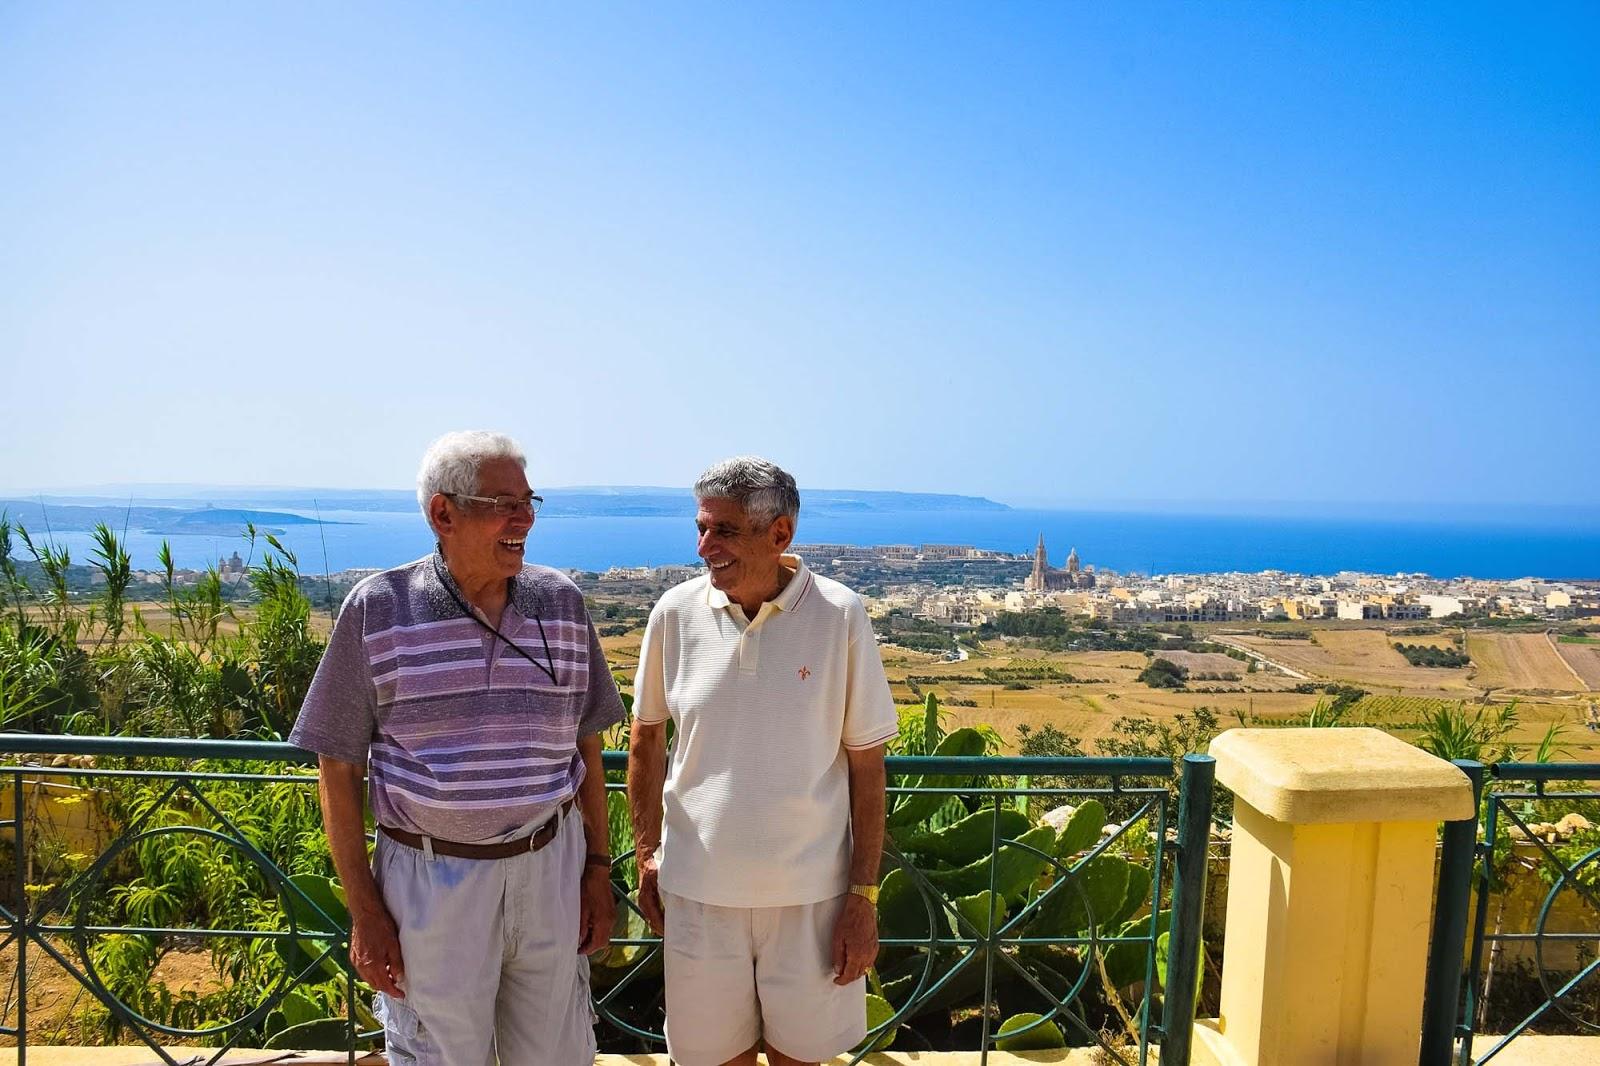 brothers in malta